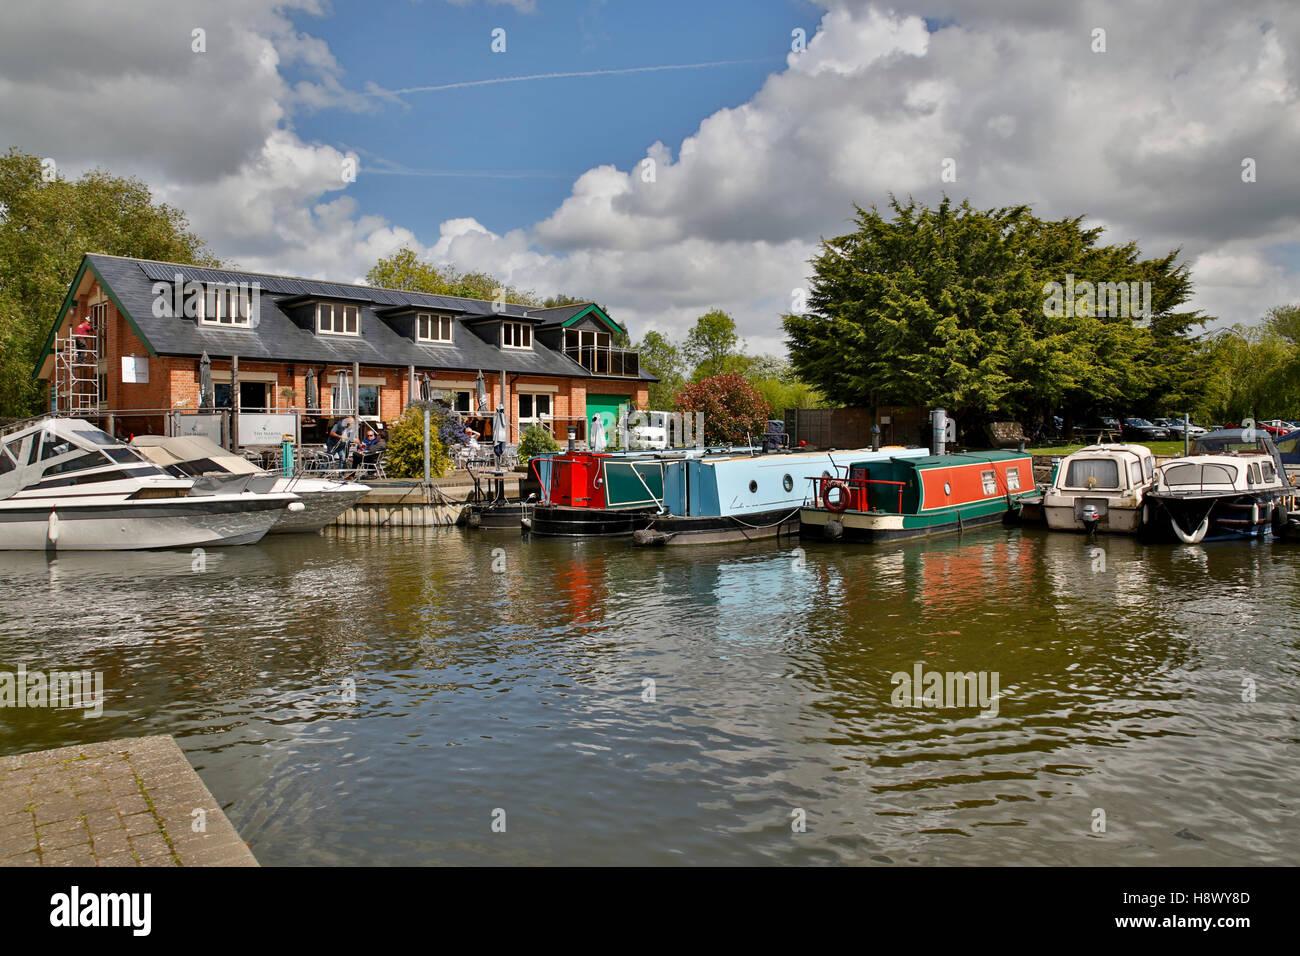 Stratford Upon Avon; Narrow Boats; UK - Stock Image